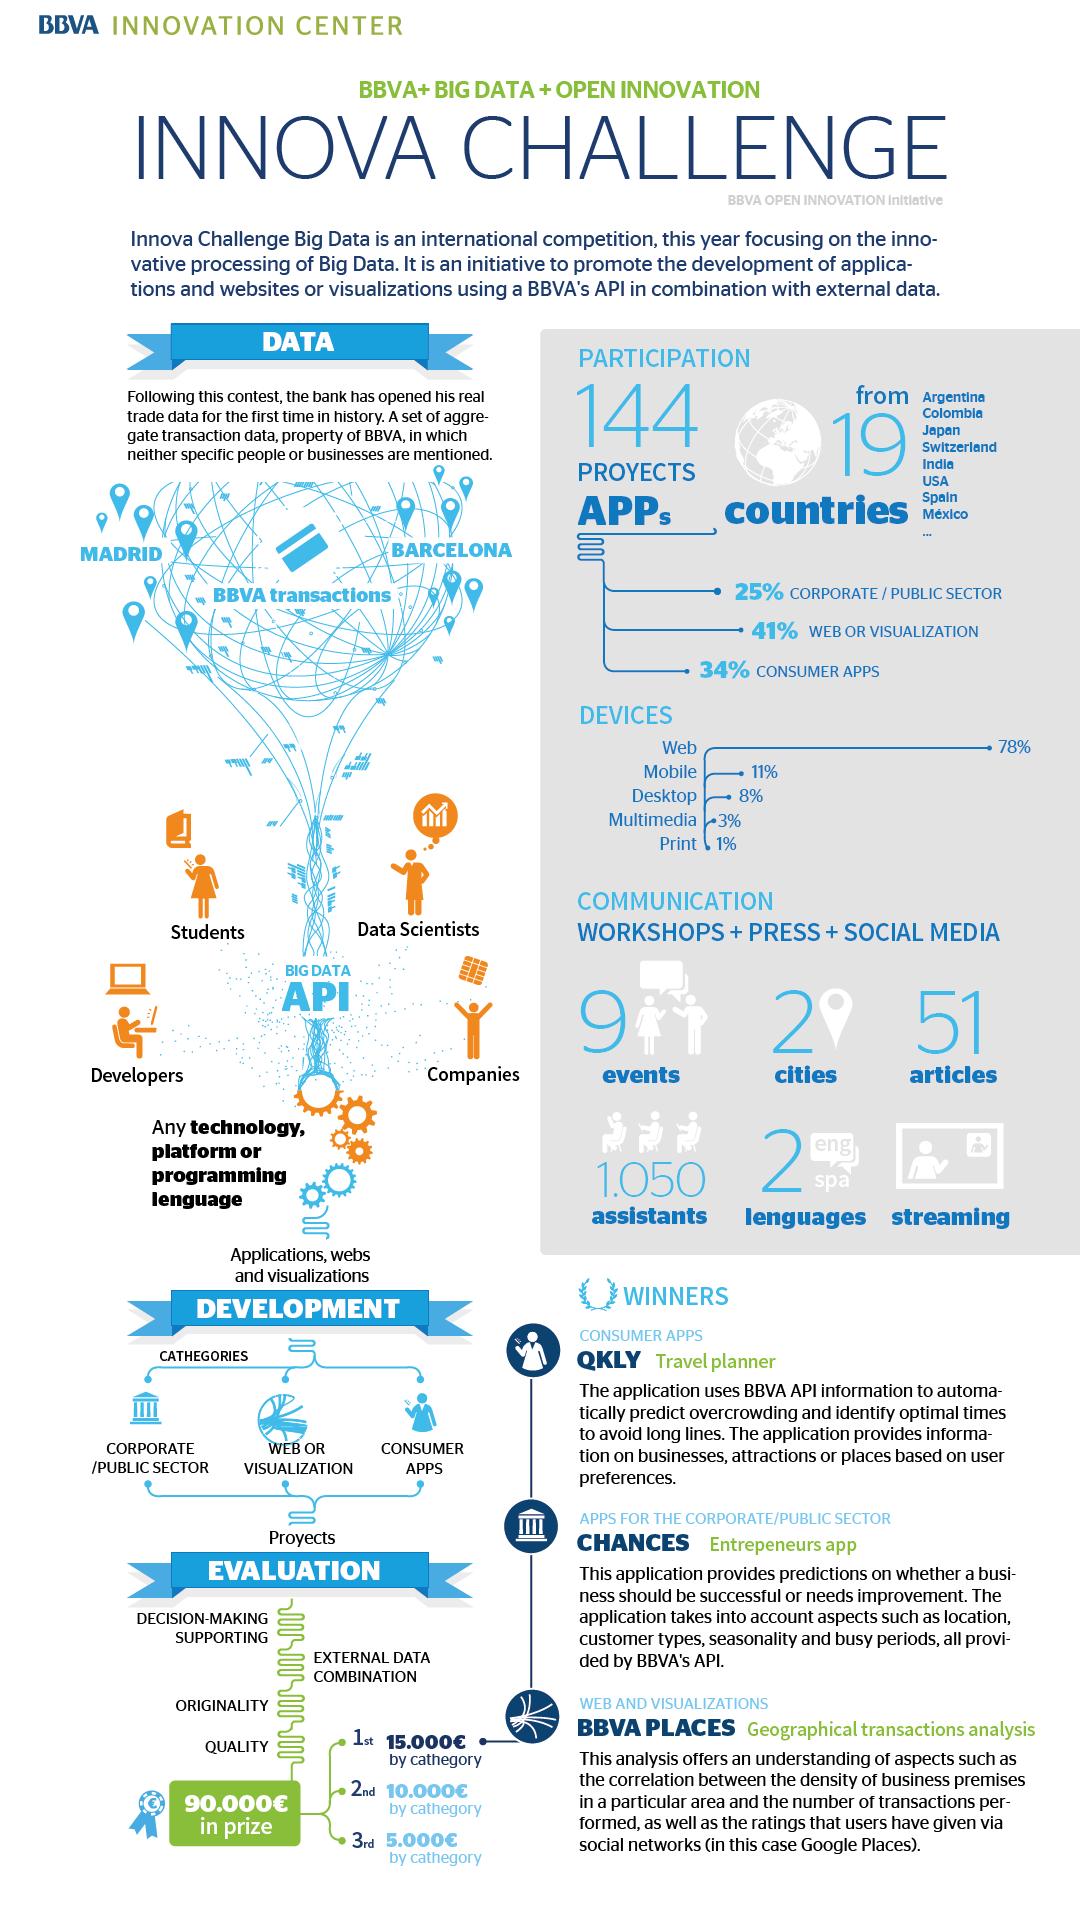 Innova Challenge Big Data highlights